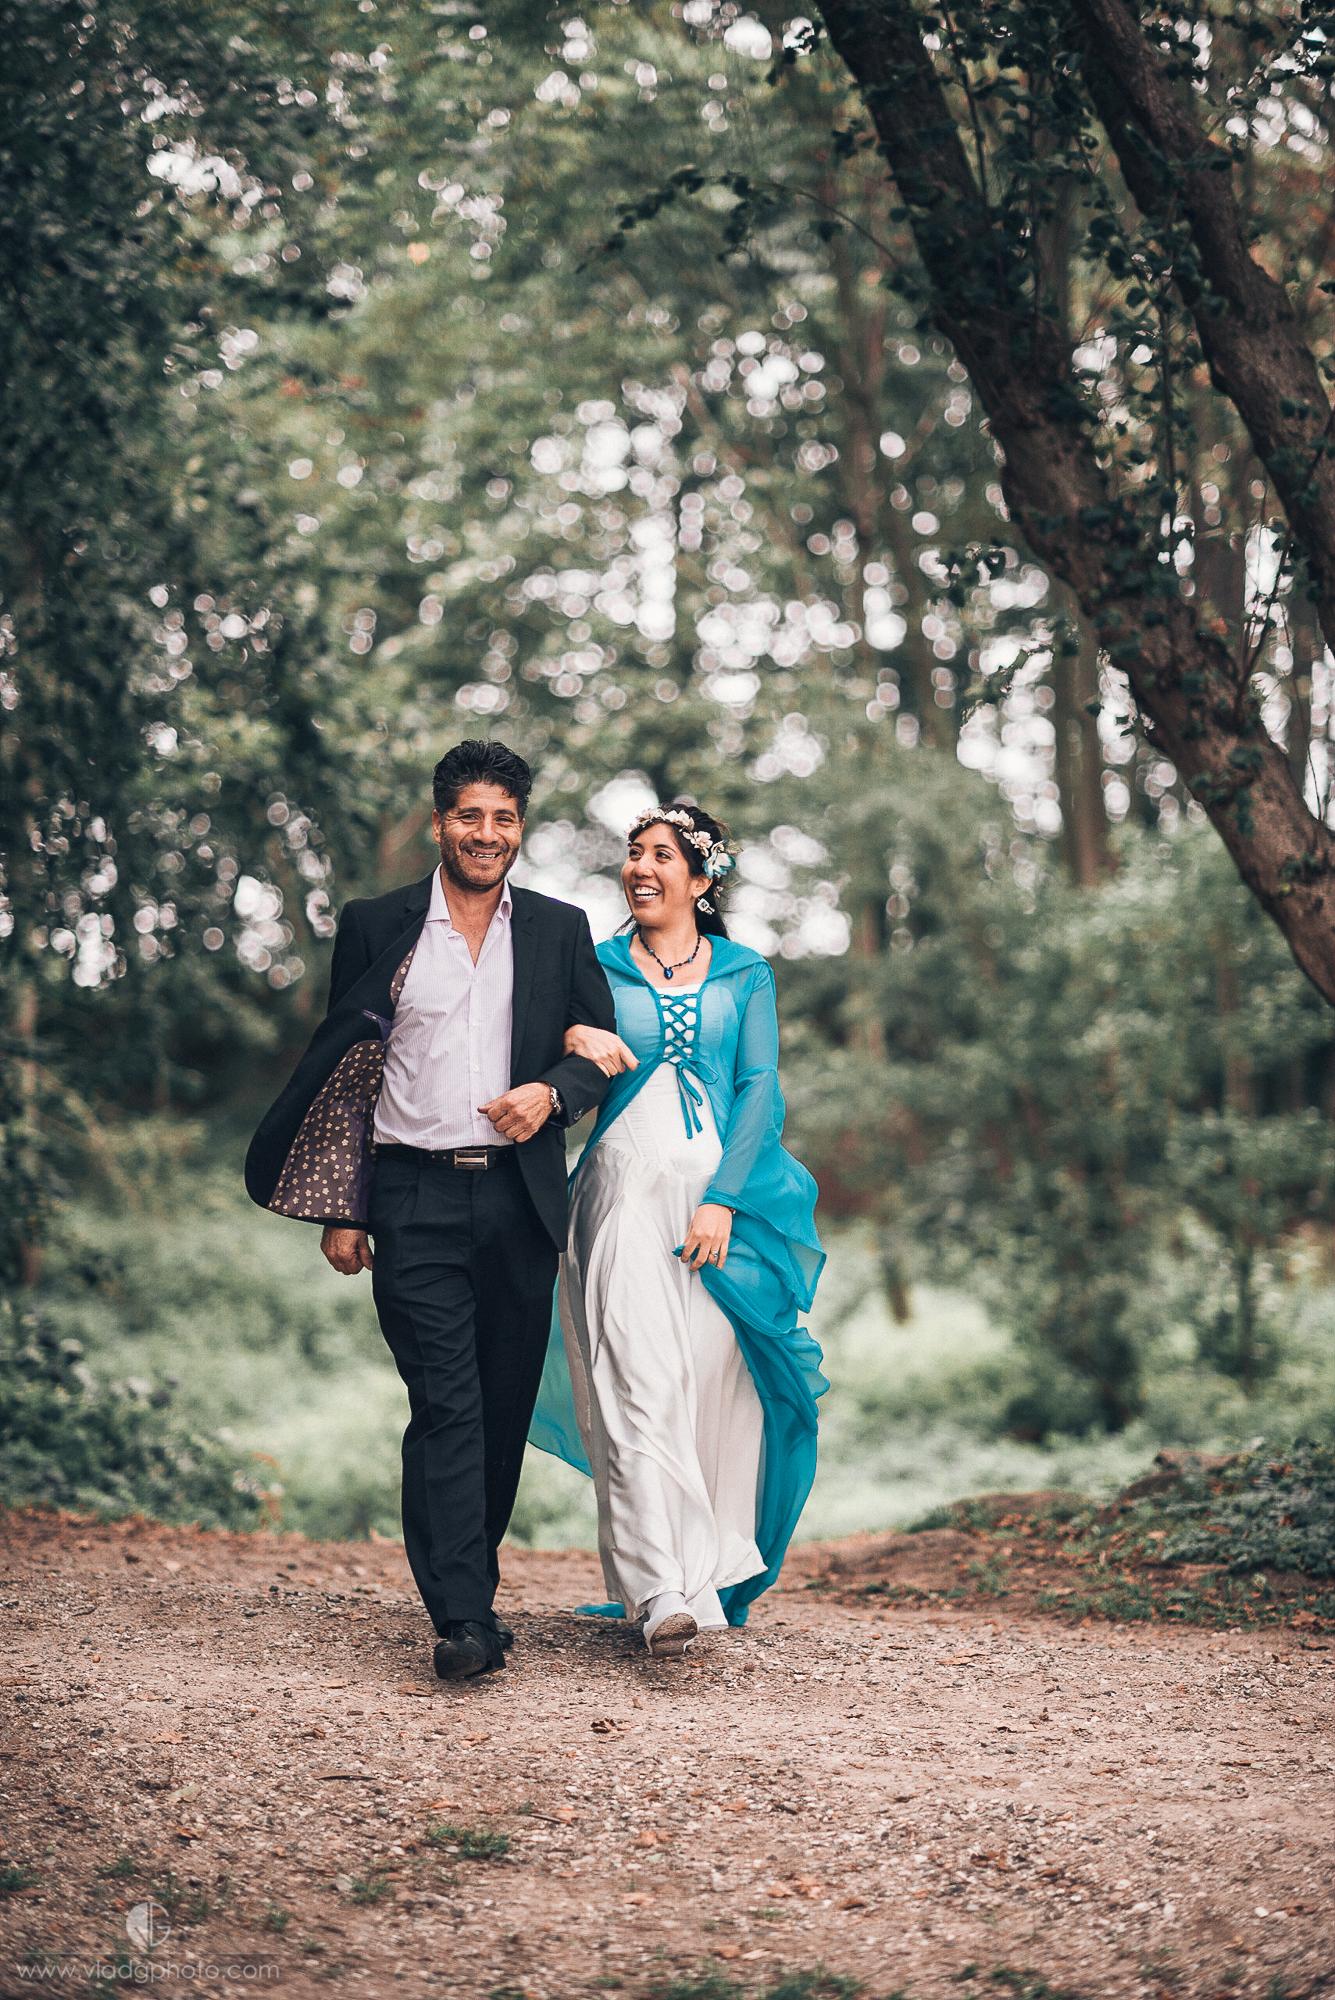 Romantic Forest Wedding Photography Denmark_9.jpg